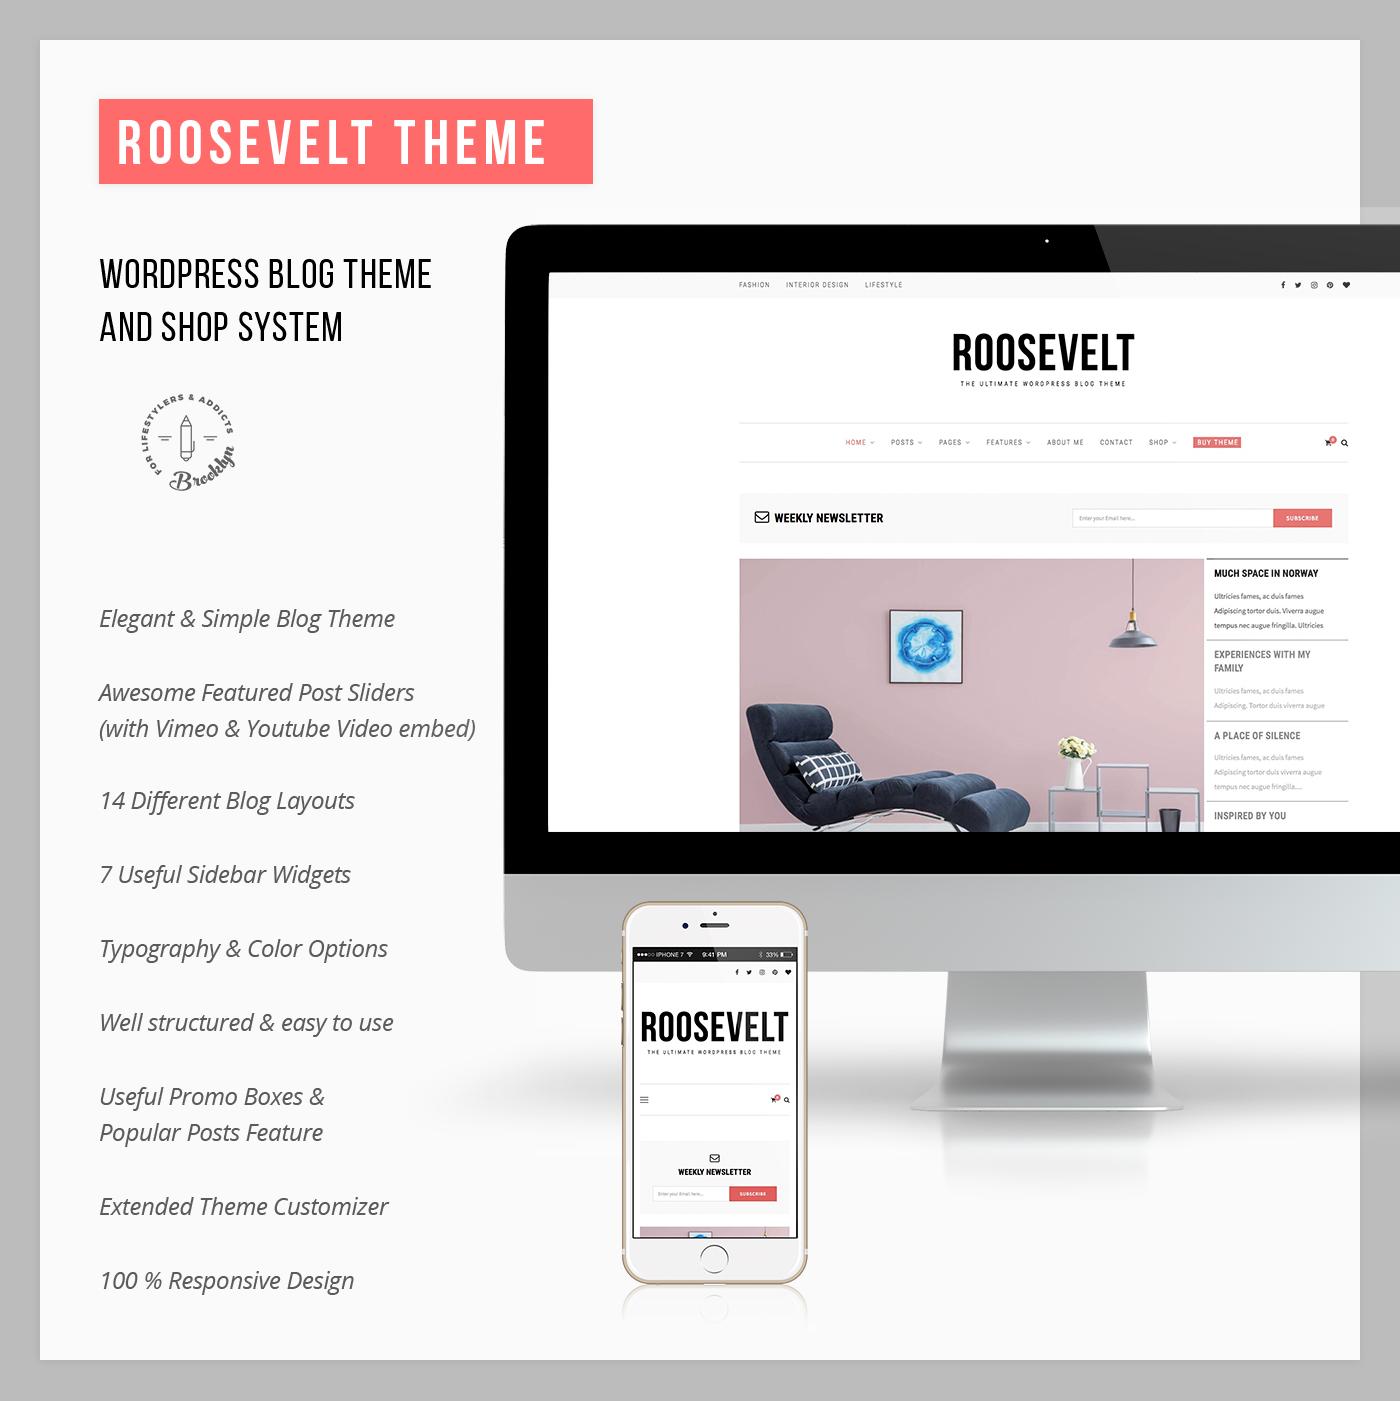 Roosevelt - Responsive WordPress Blog Theme - 7